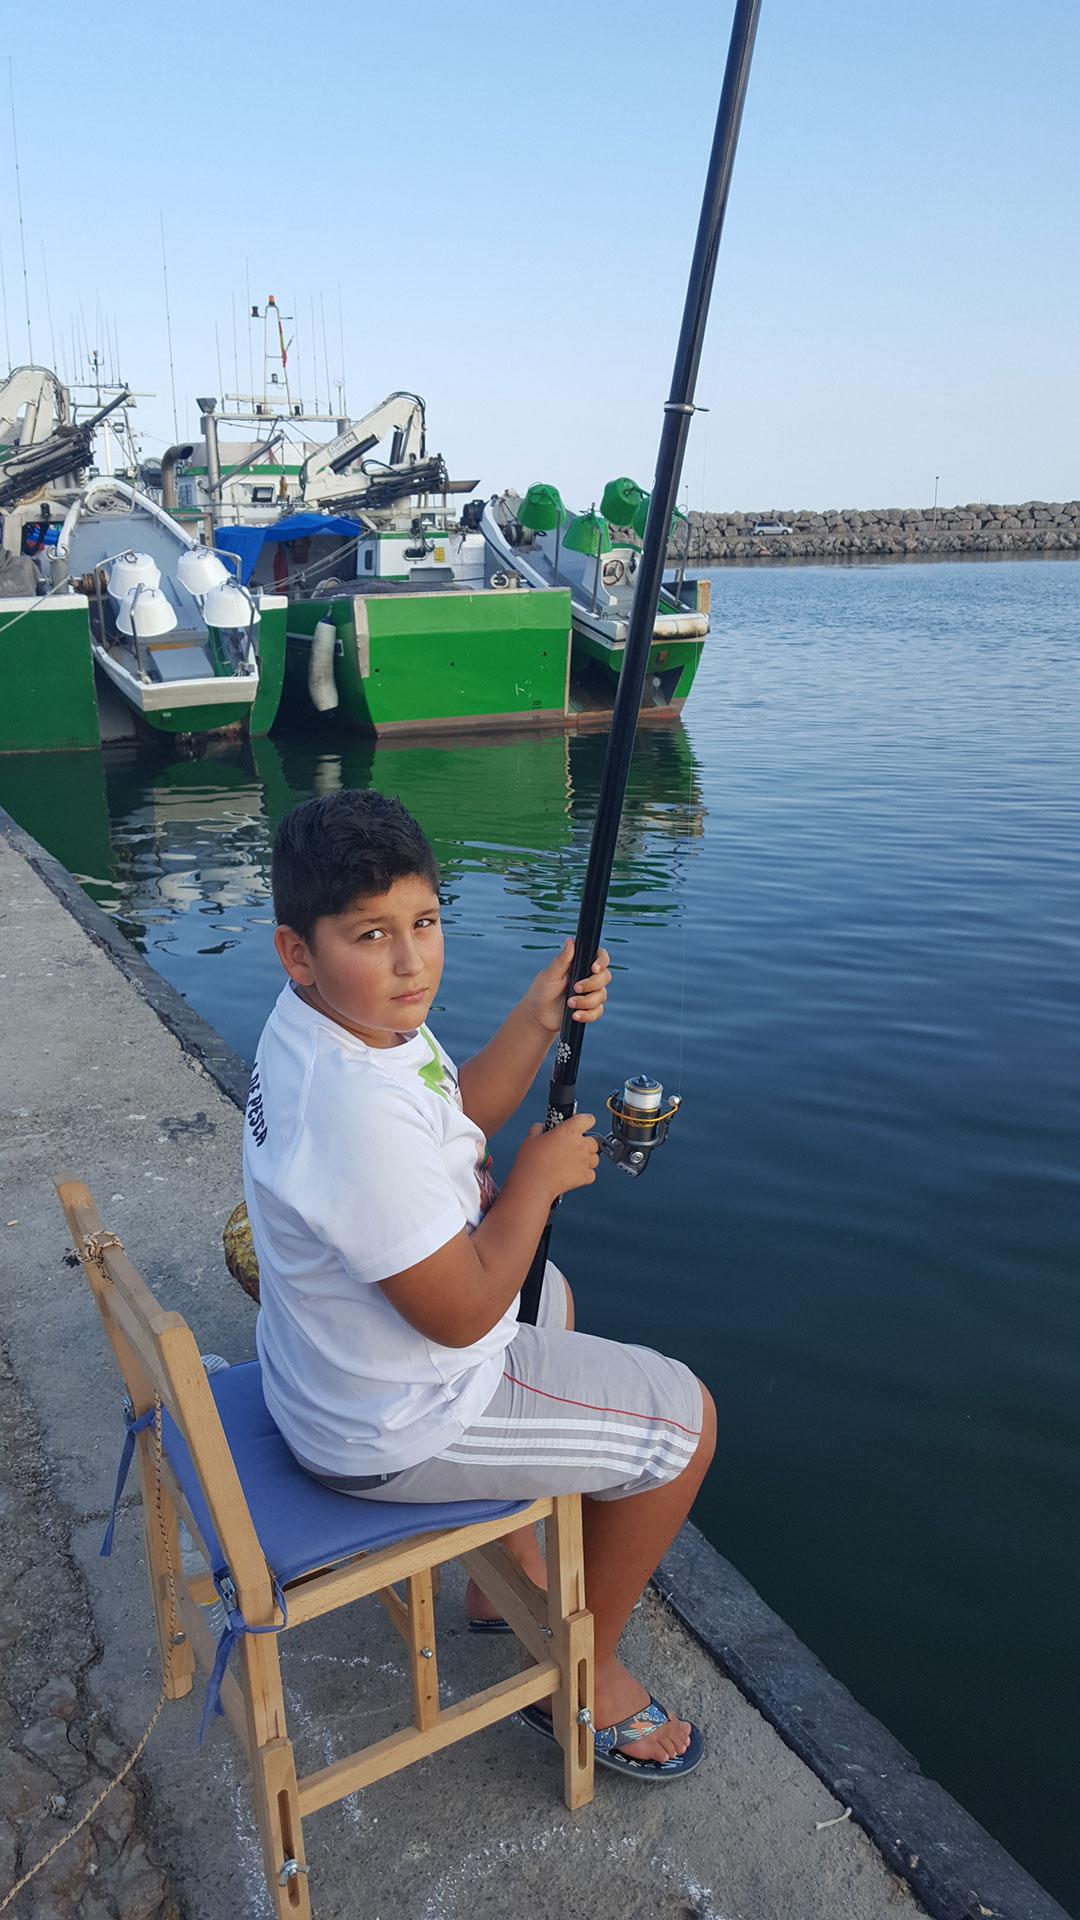 160811-curso-pesca-191758